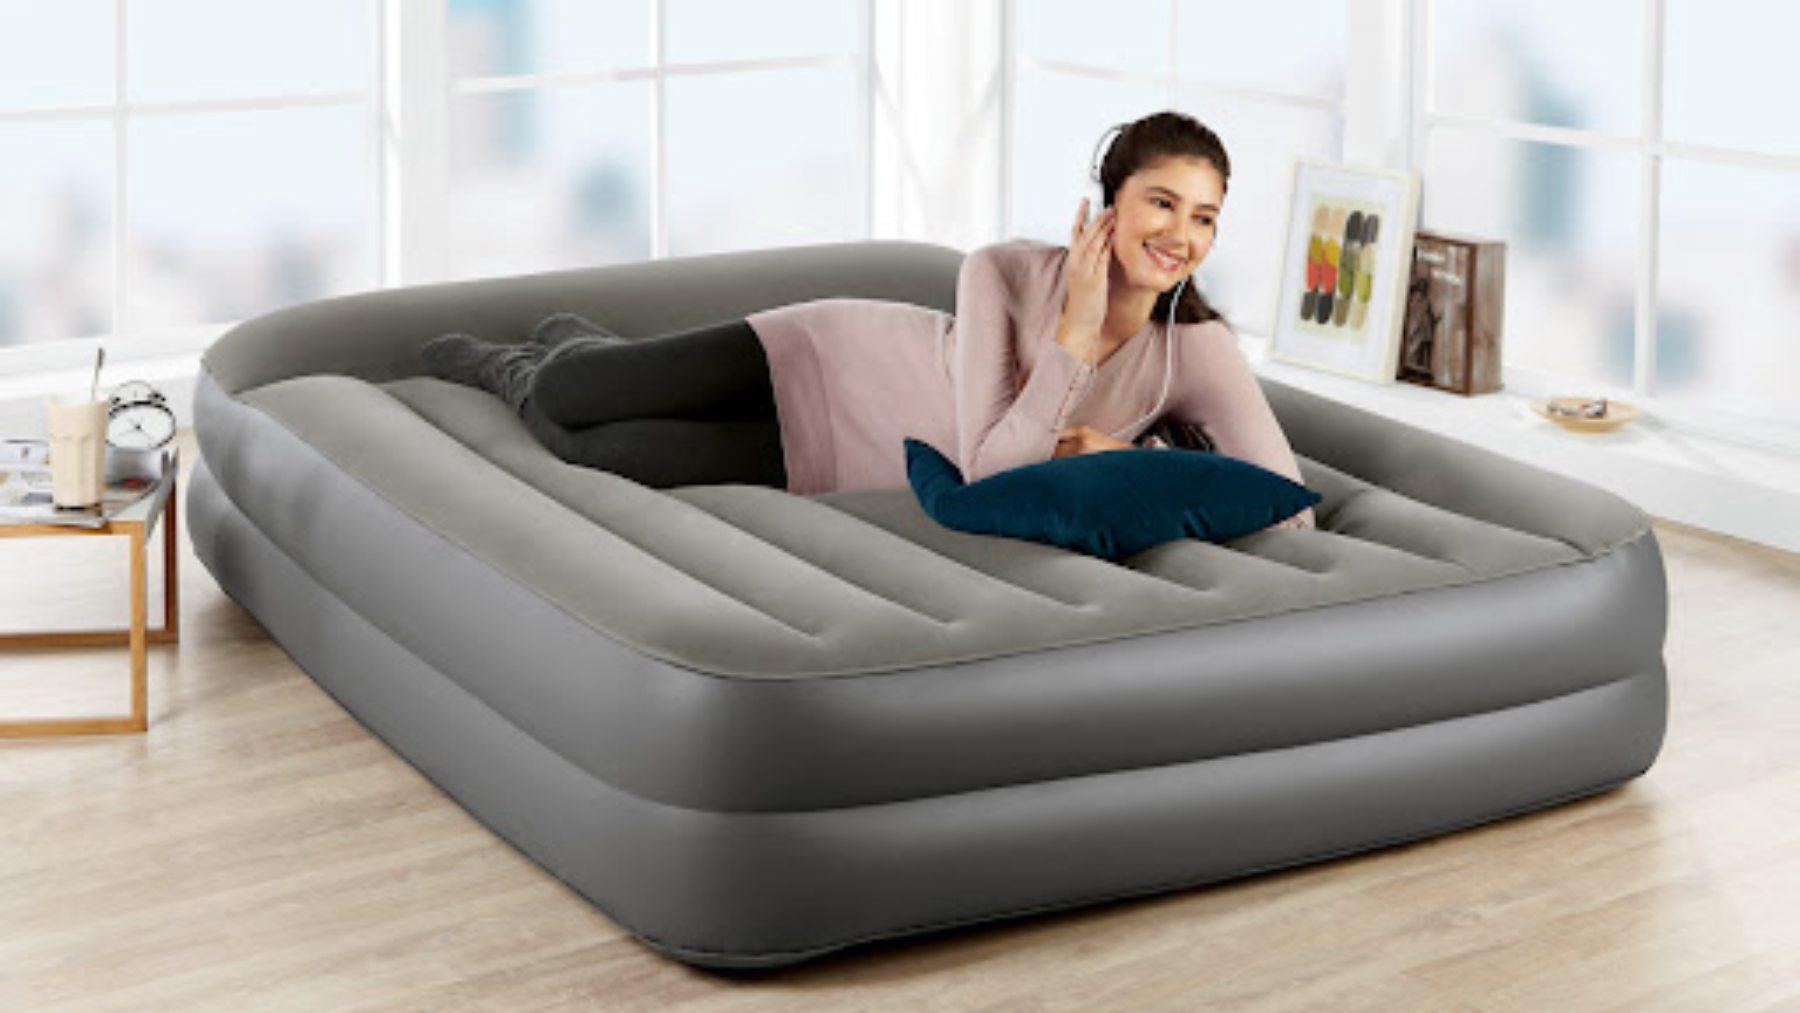 El colchón de Lidl